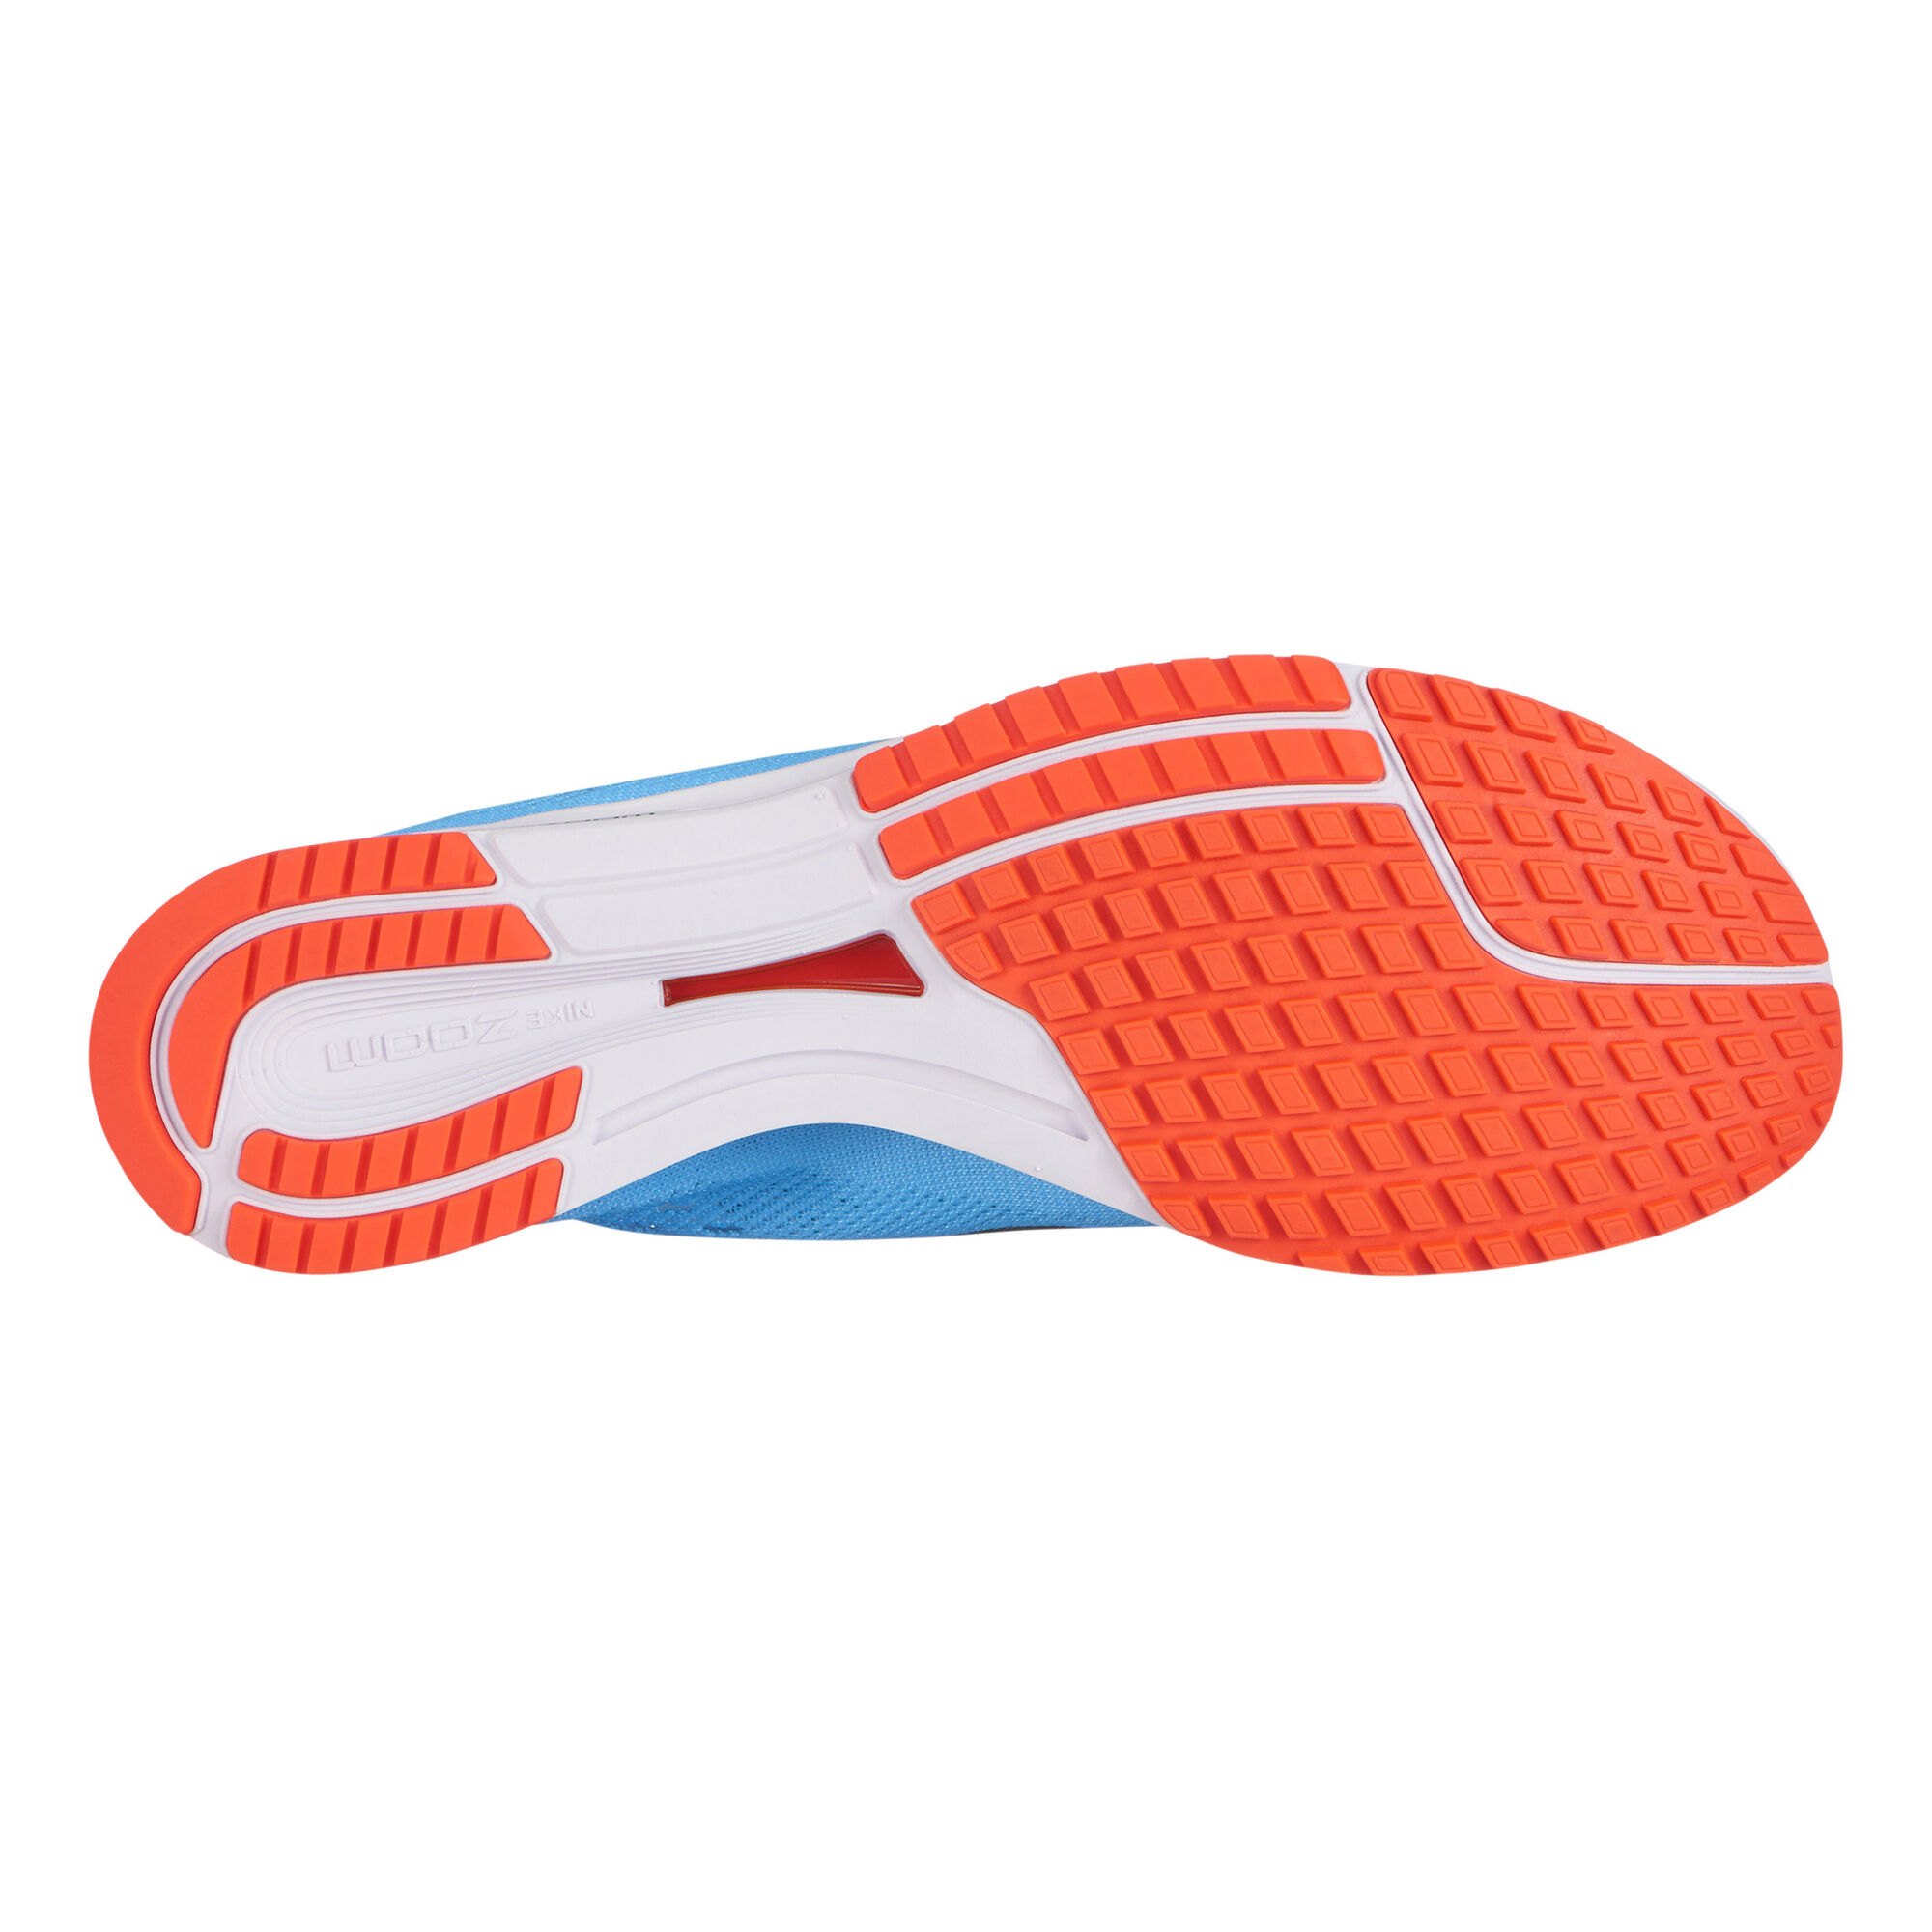 64e66ea7ef3 buy Nike Zoom Streak LT 4 Spike Shoes - Light Blue